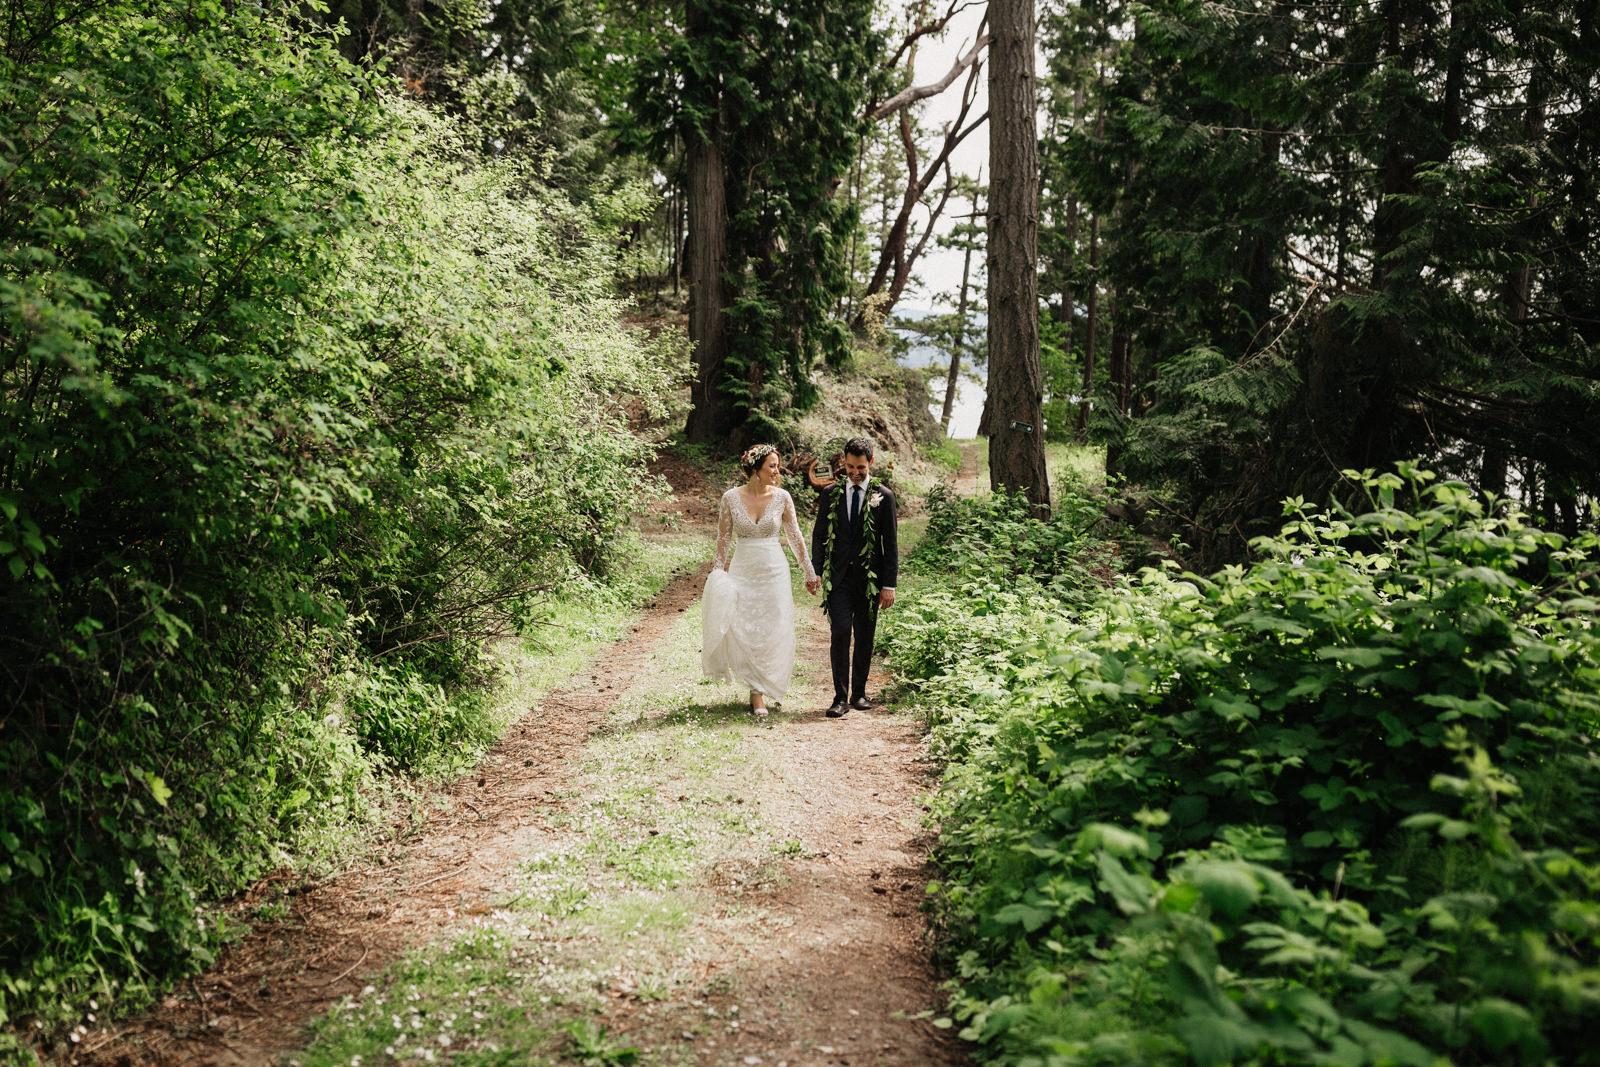 Bodega Ridge Galiano Island Wedding Photographer Kim Jay-48.jpg